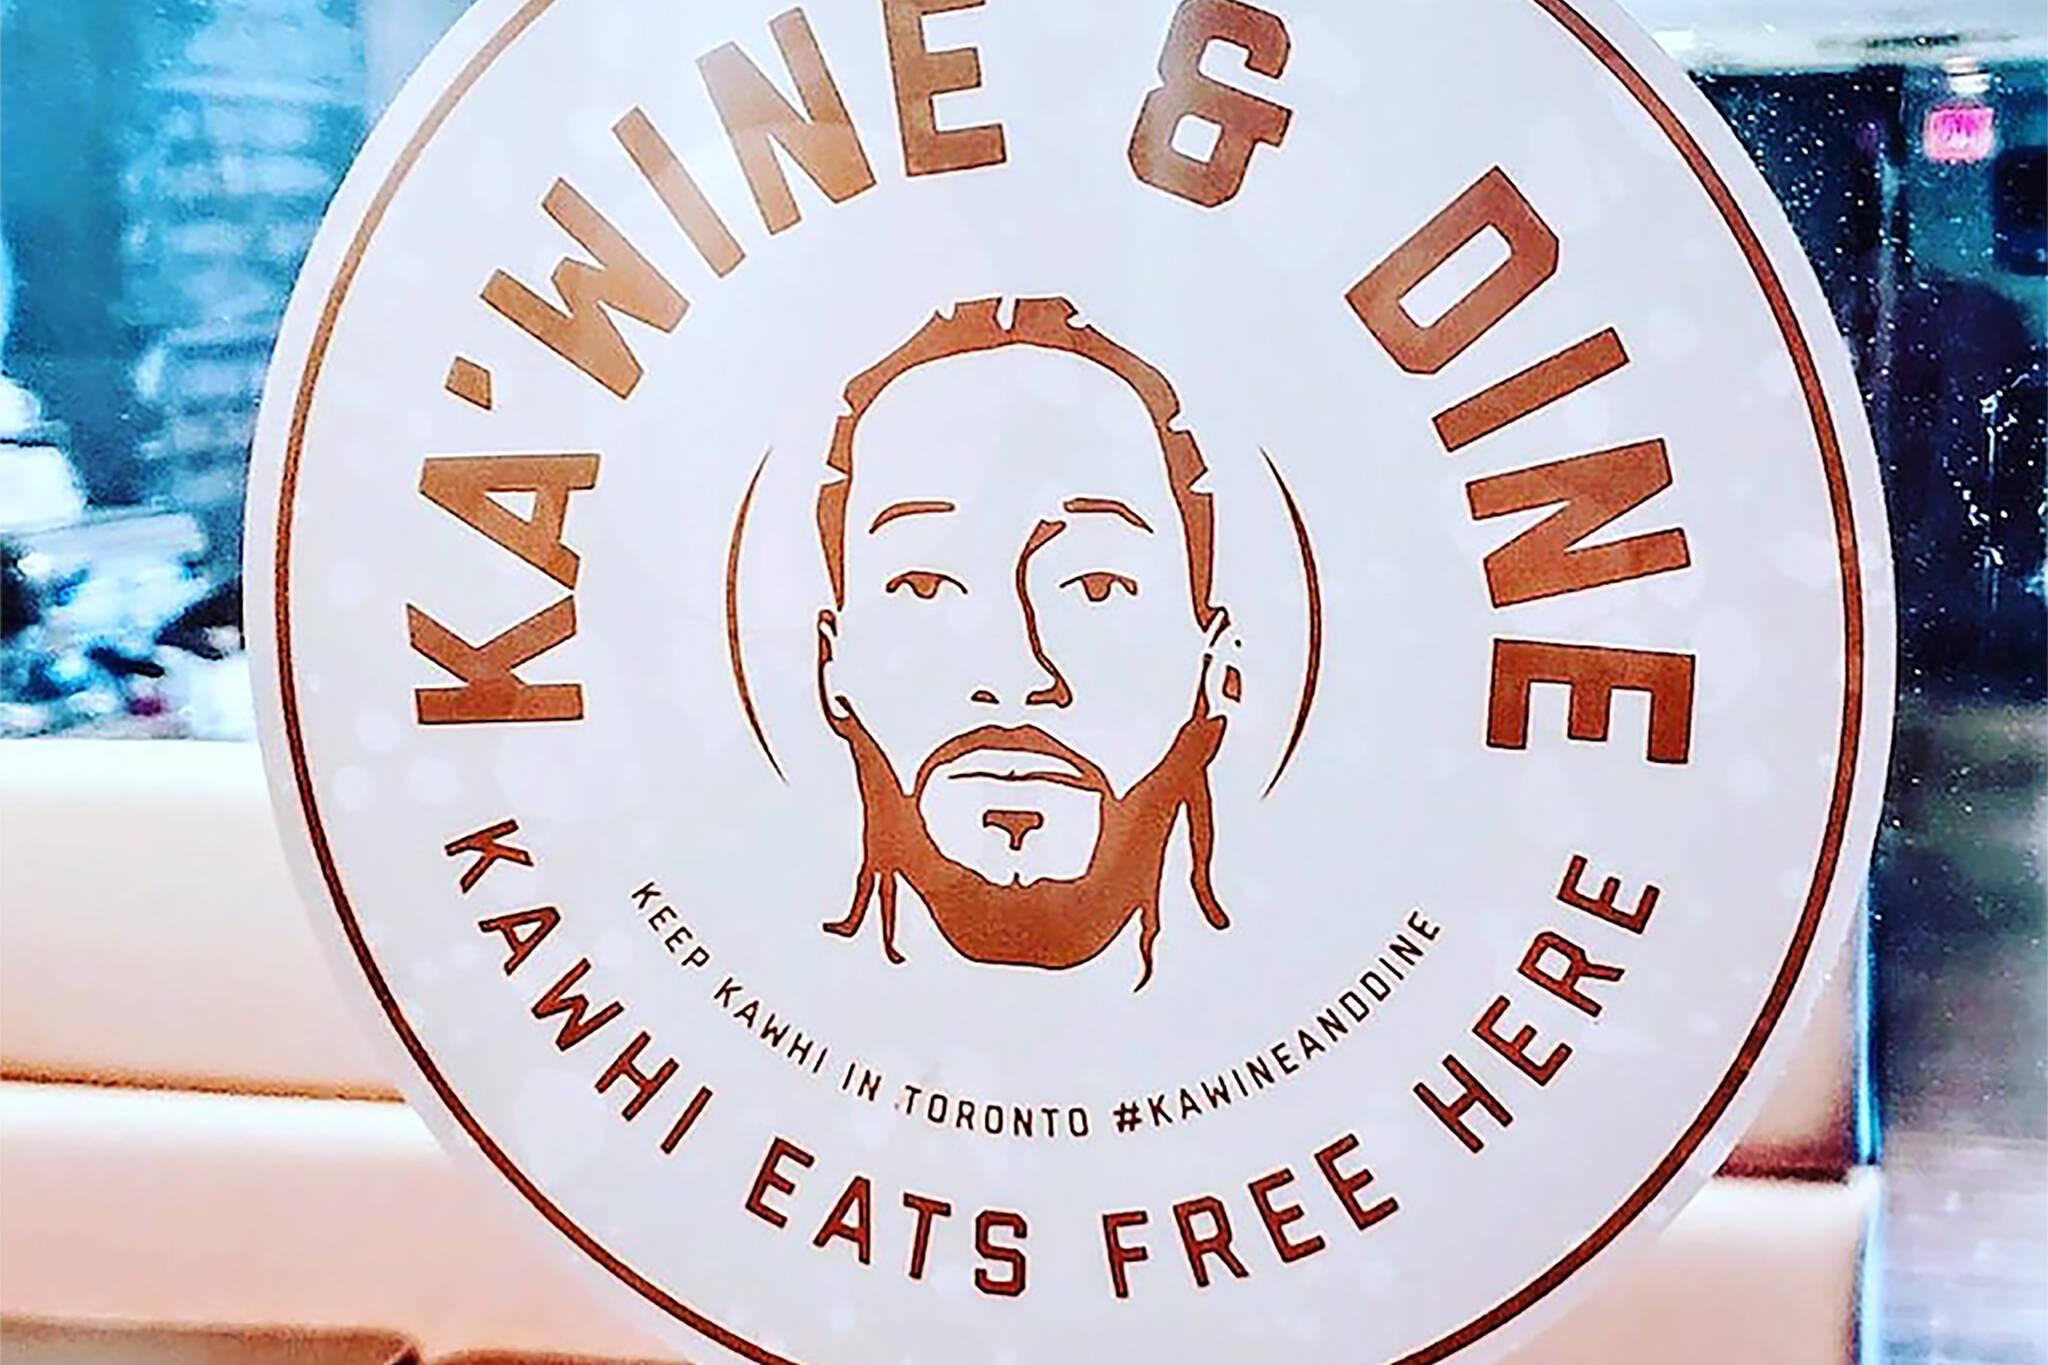 kawine and dine